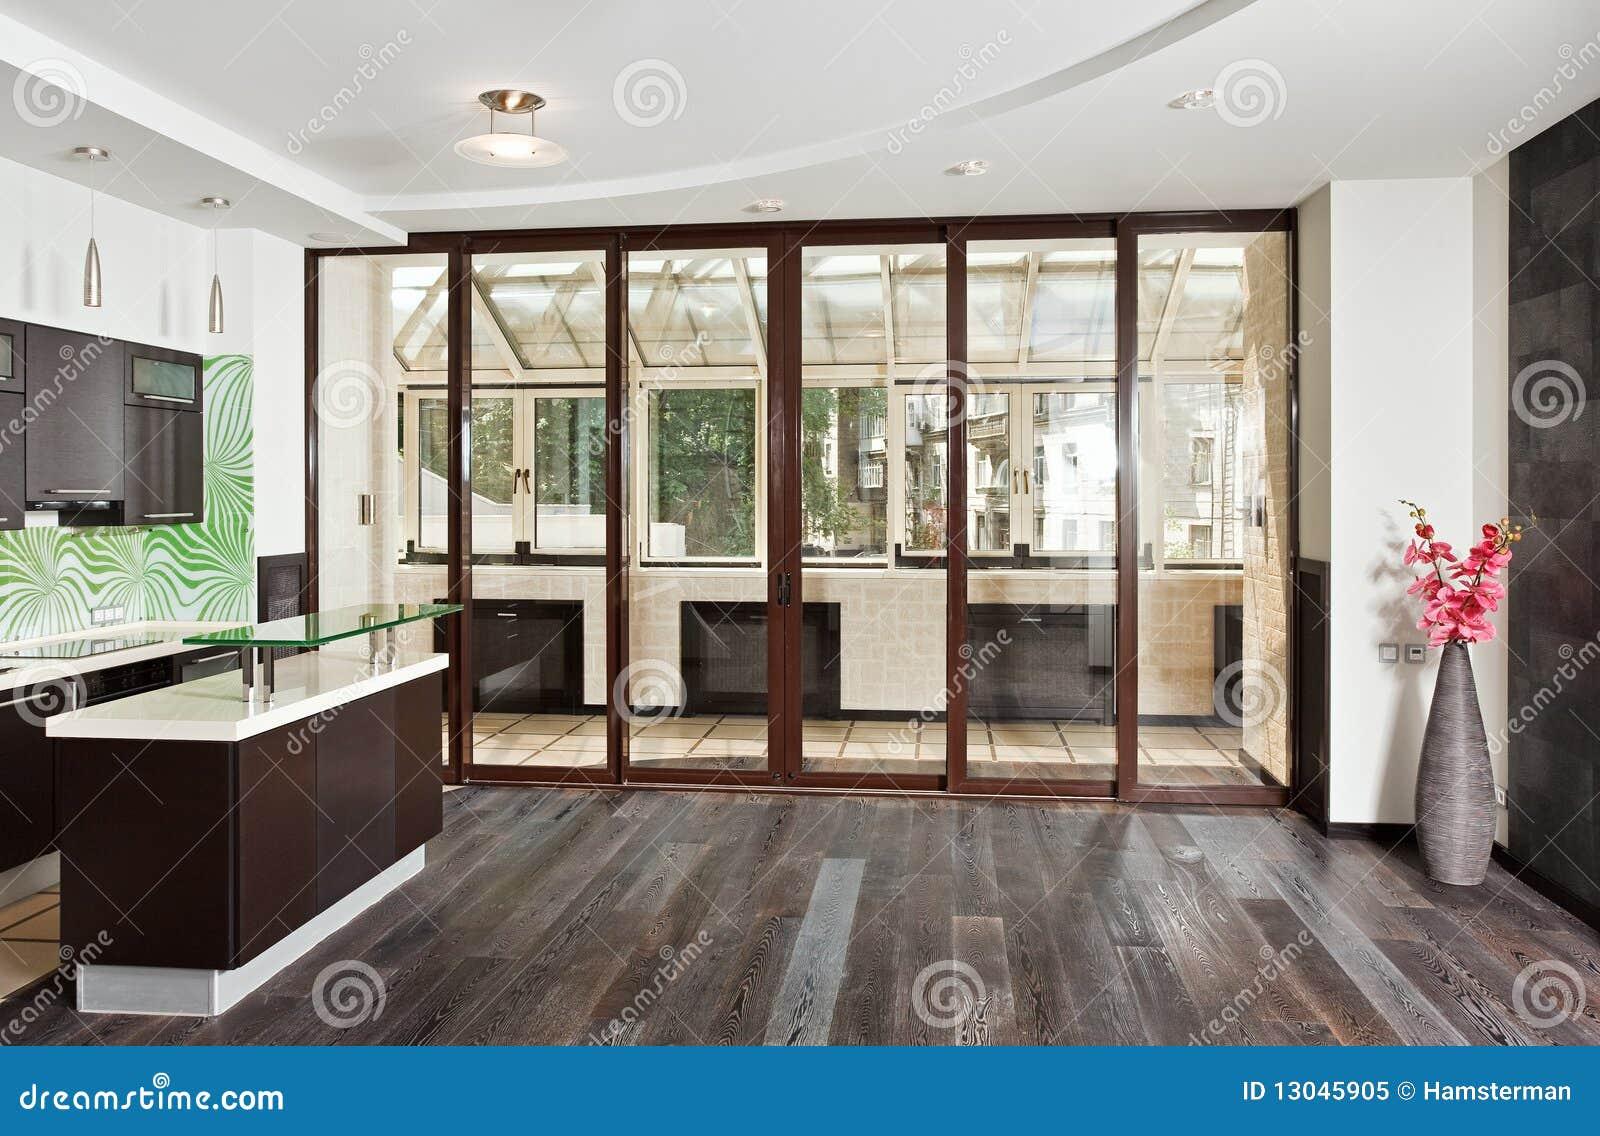 Moderne woonkamer en keuken met balkon royalty vrije stock foto beeld 13045905 - Woonkamer en moderne keuken ...